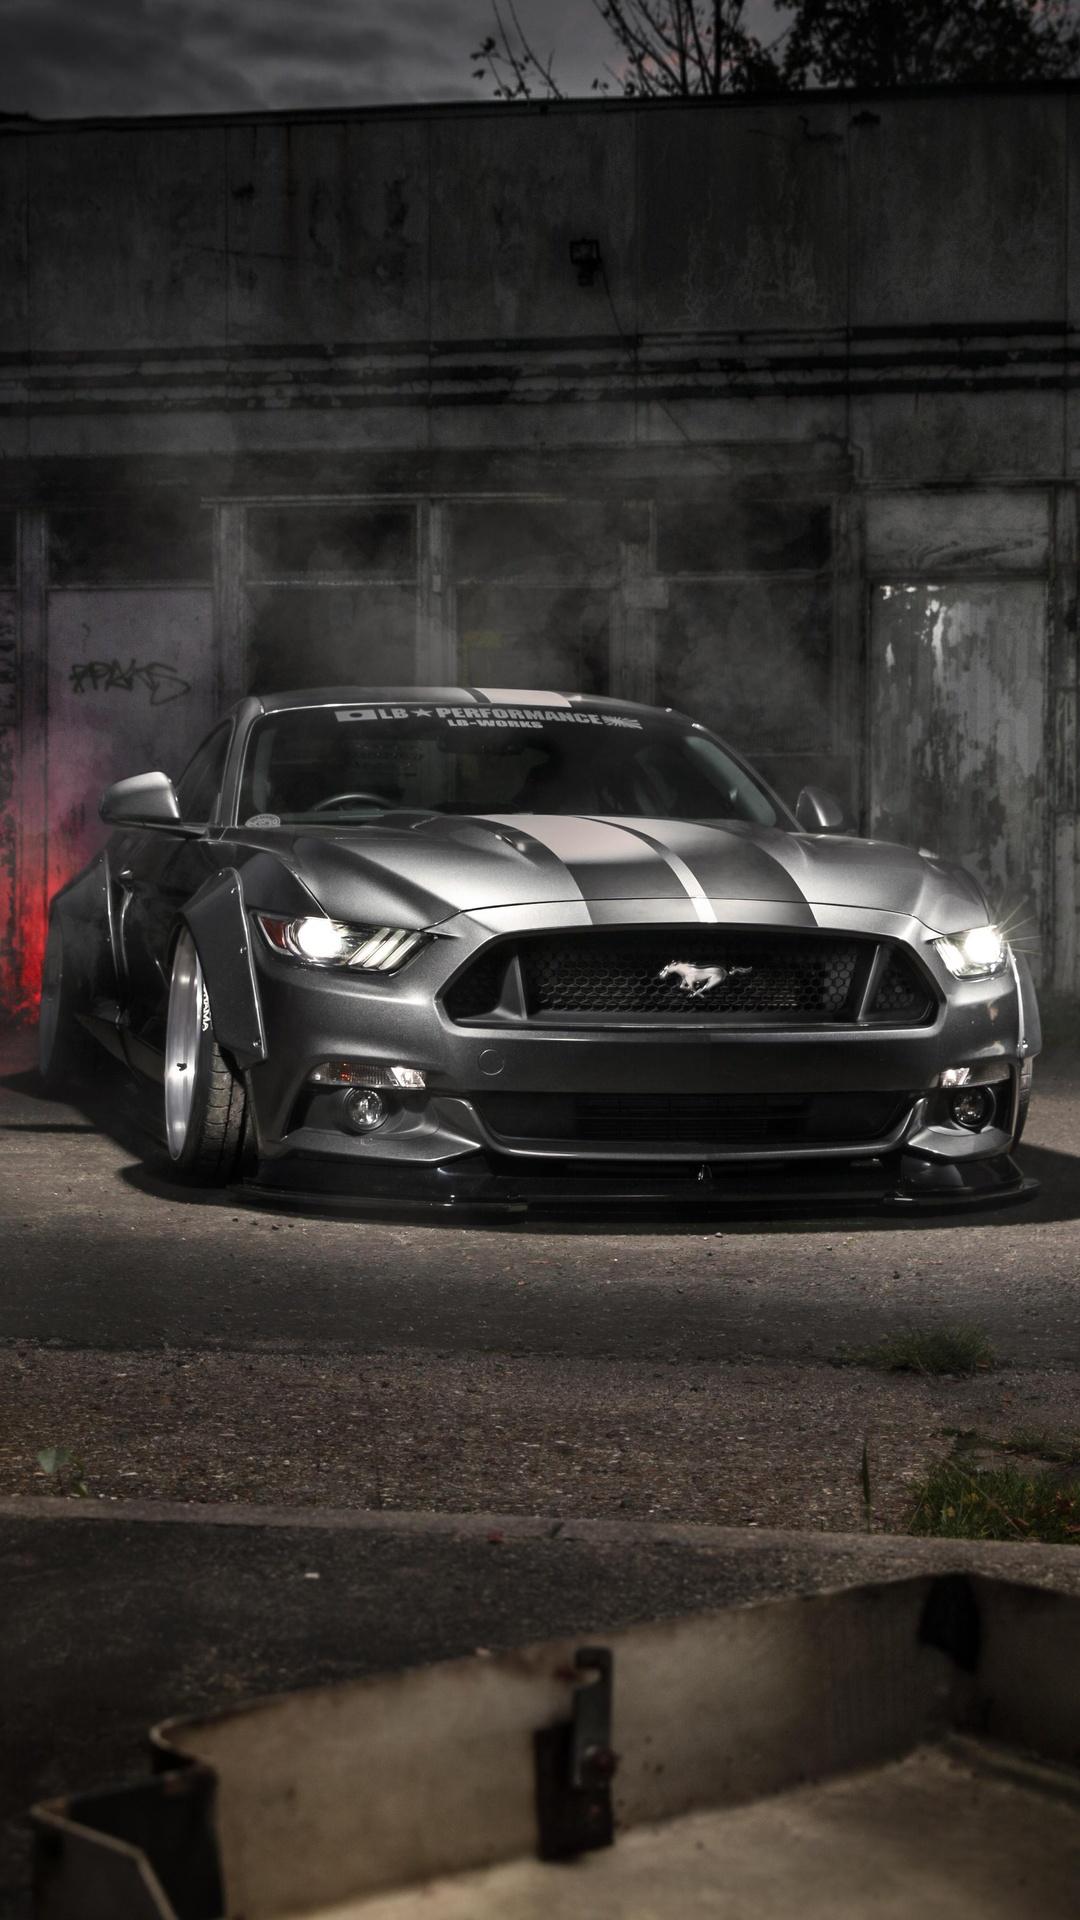 1080x1920 Custom Mustang Iphone 7,6s,6 Plus, Pixel xl ,One ...